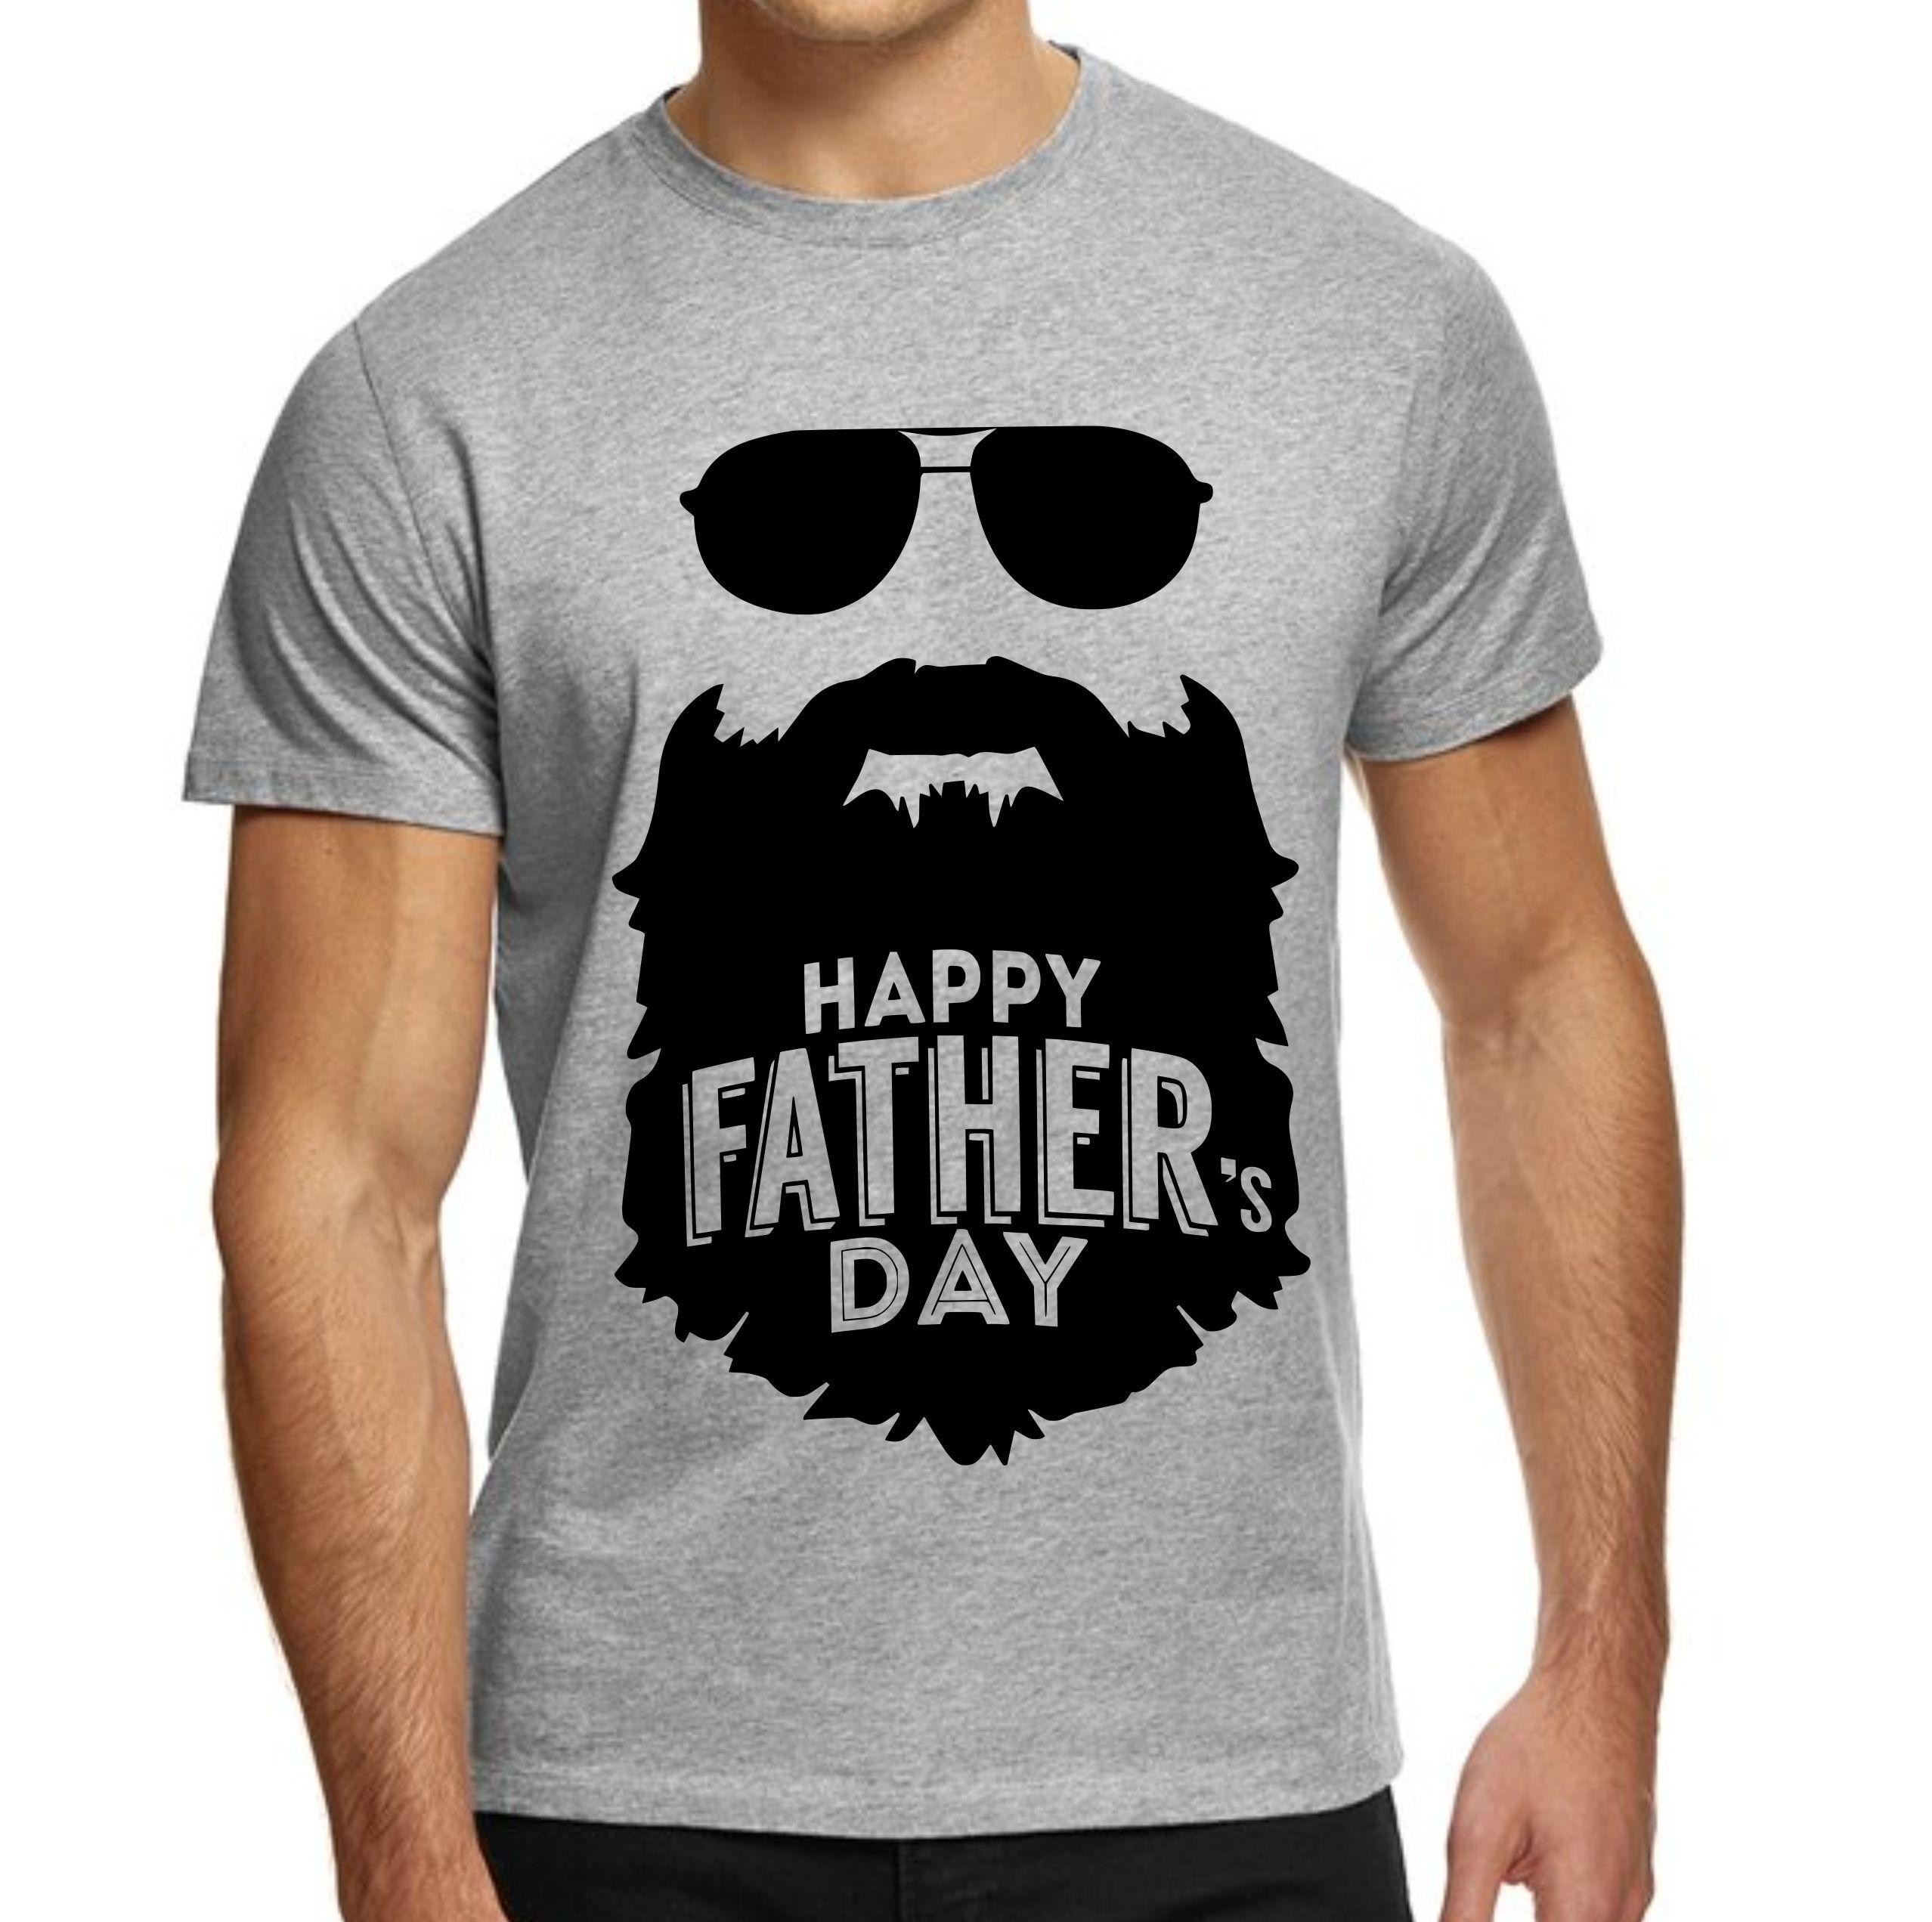 4e65dda56 Pin by Artistshot on artistshot | Pinterest | Happy father, Father ...